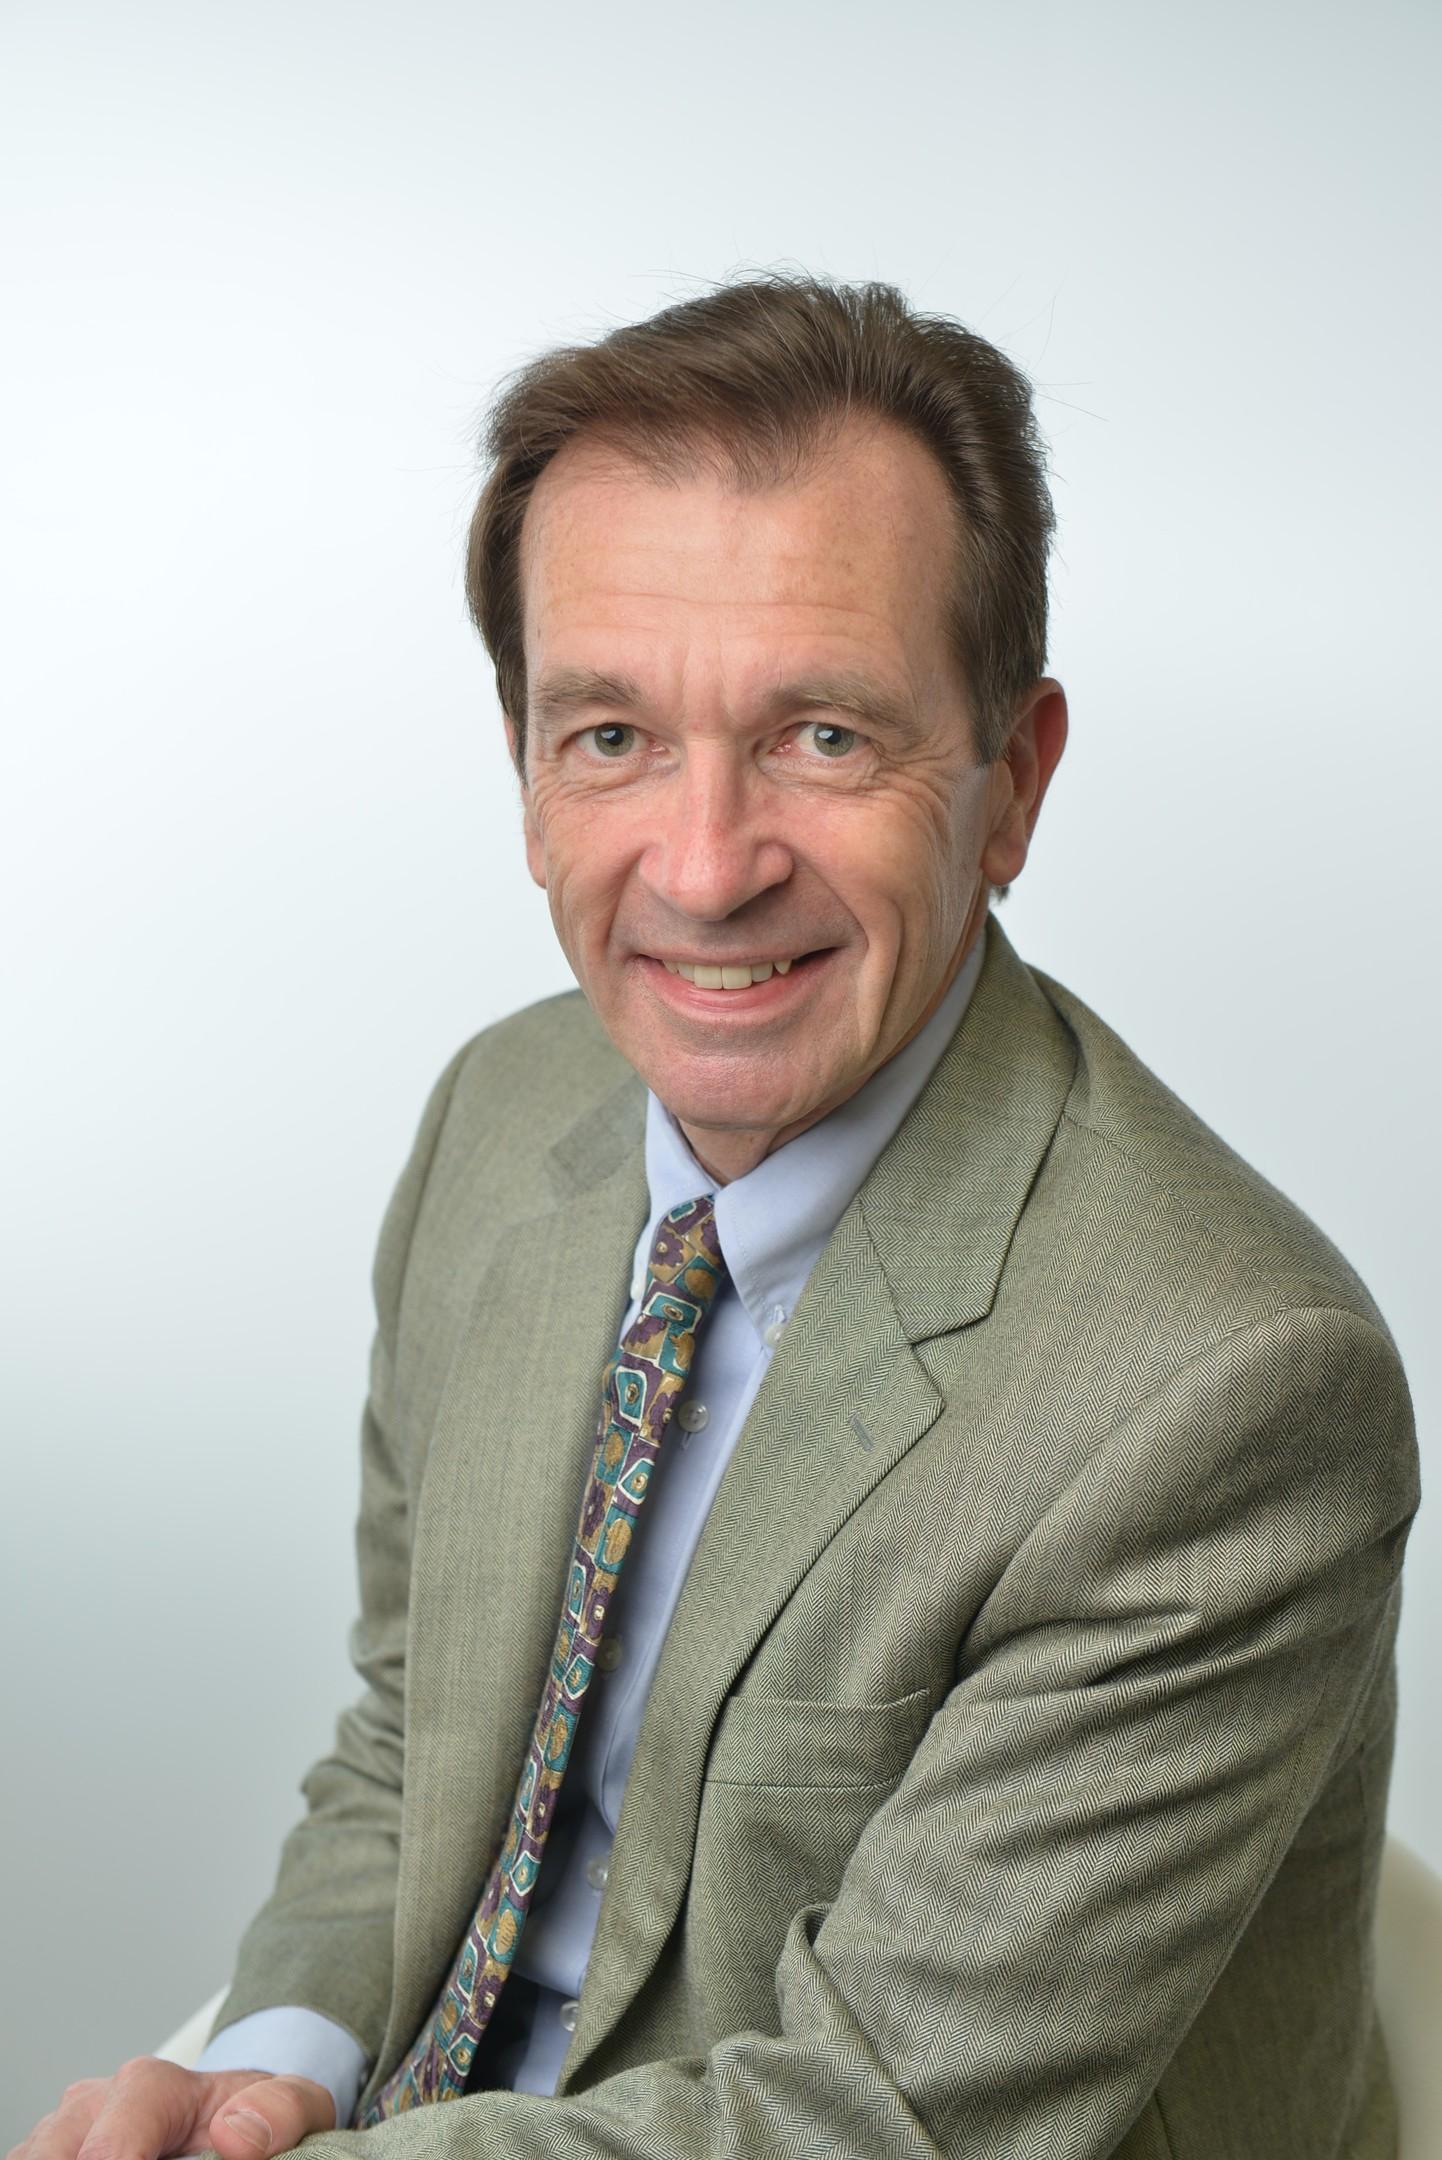 Visit Profile of Thomas G Plante PhD, ABPP